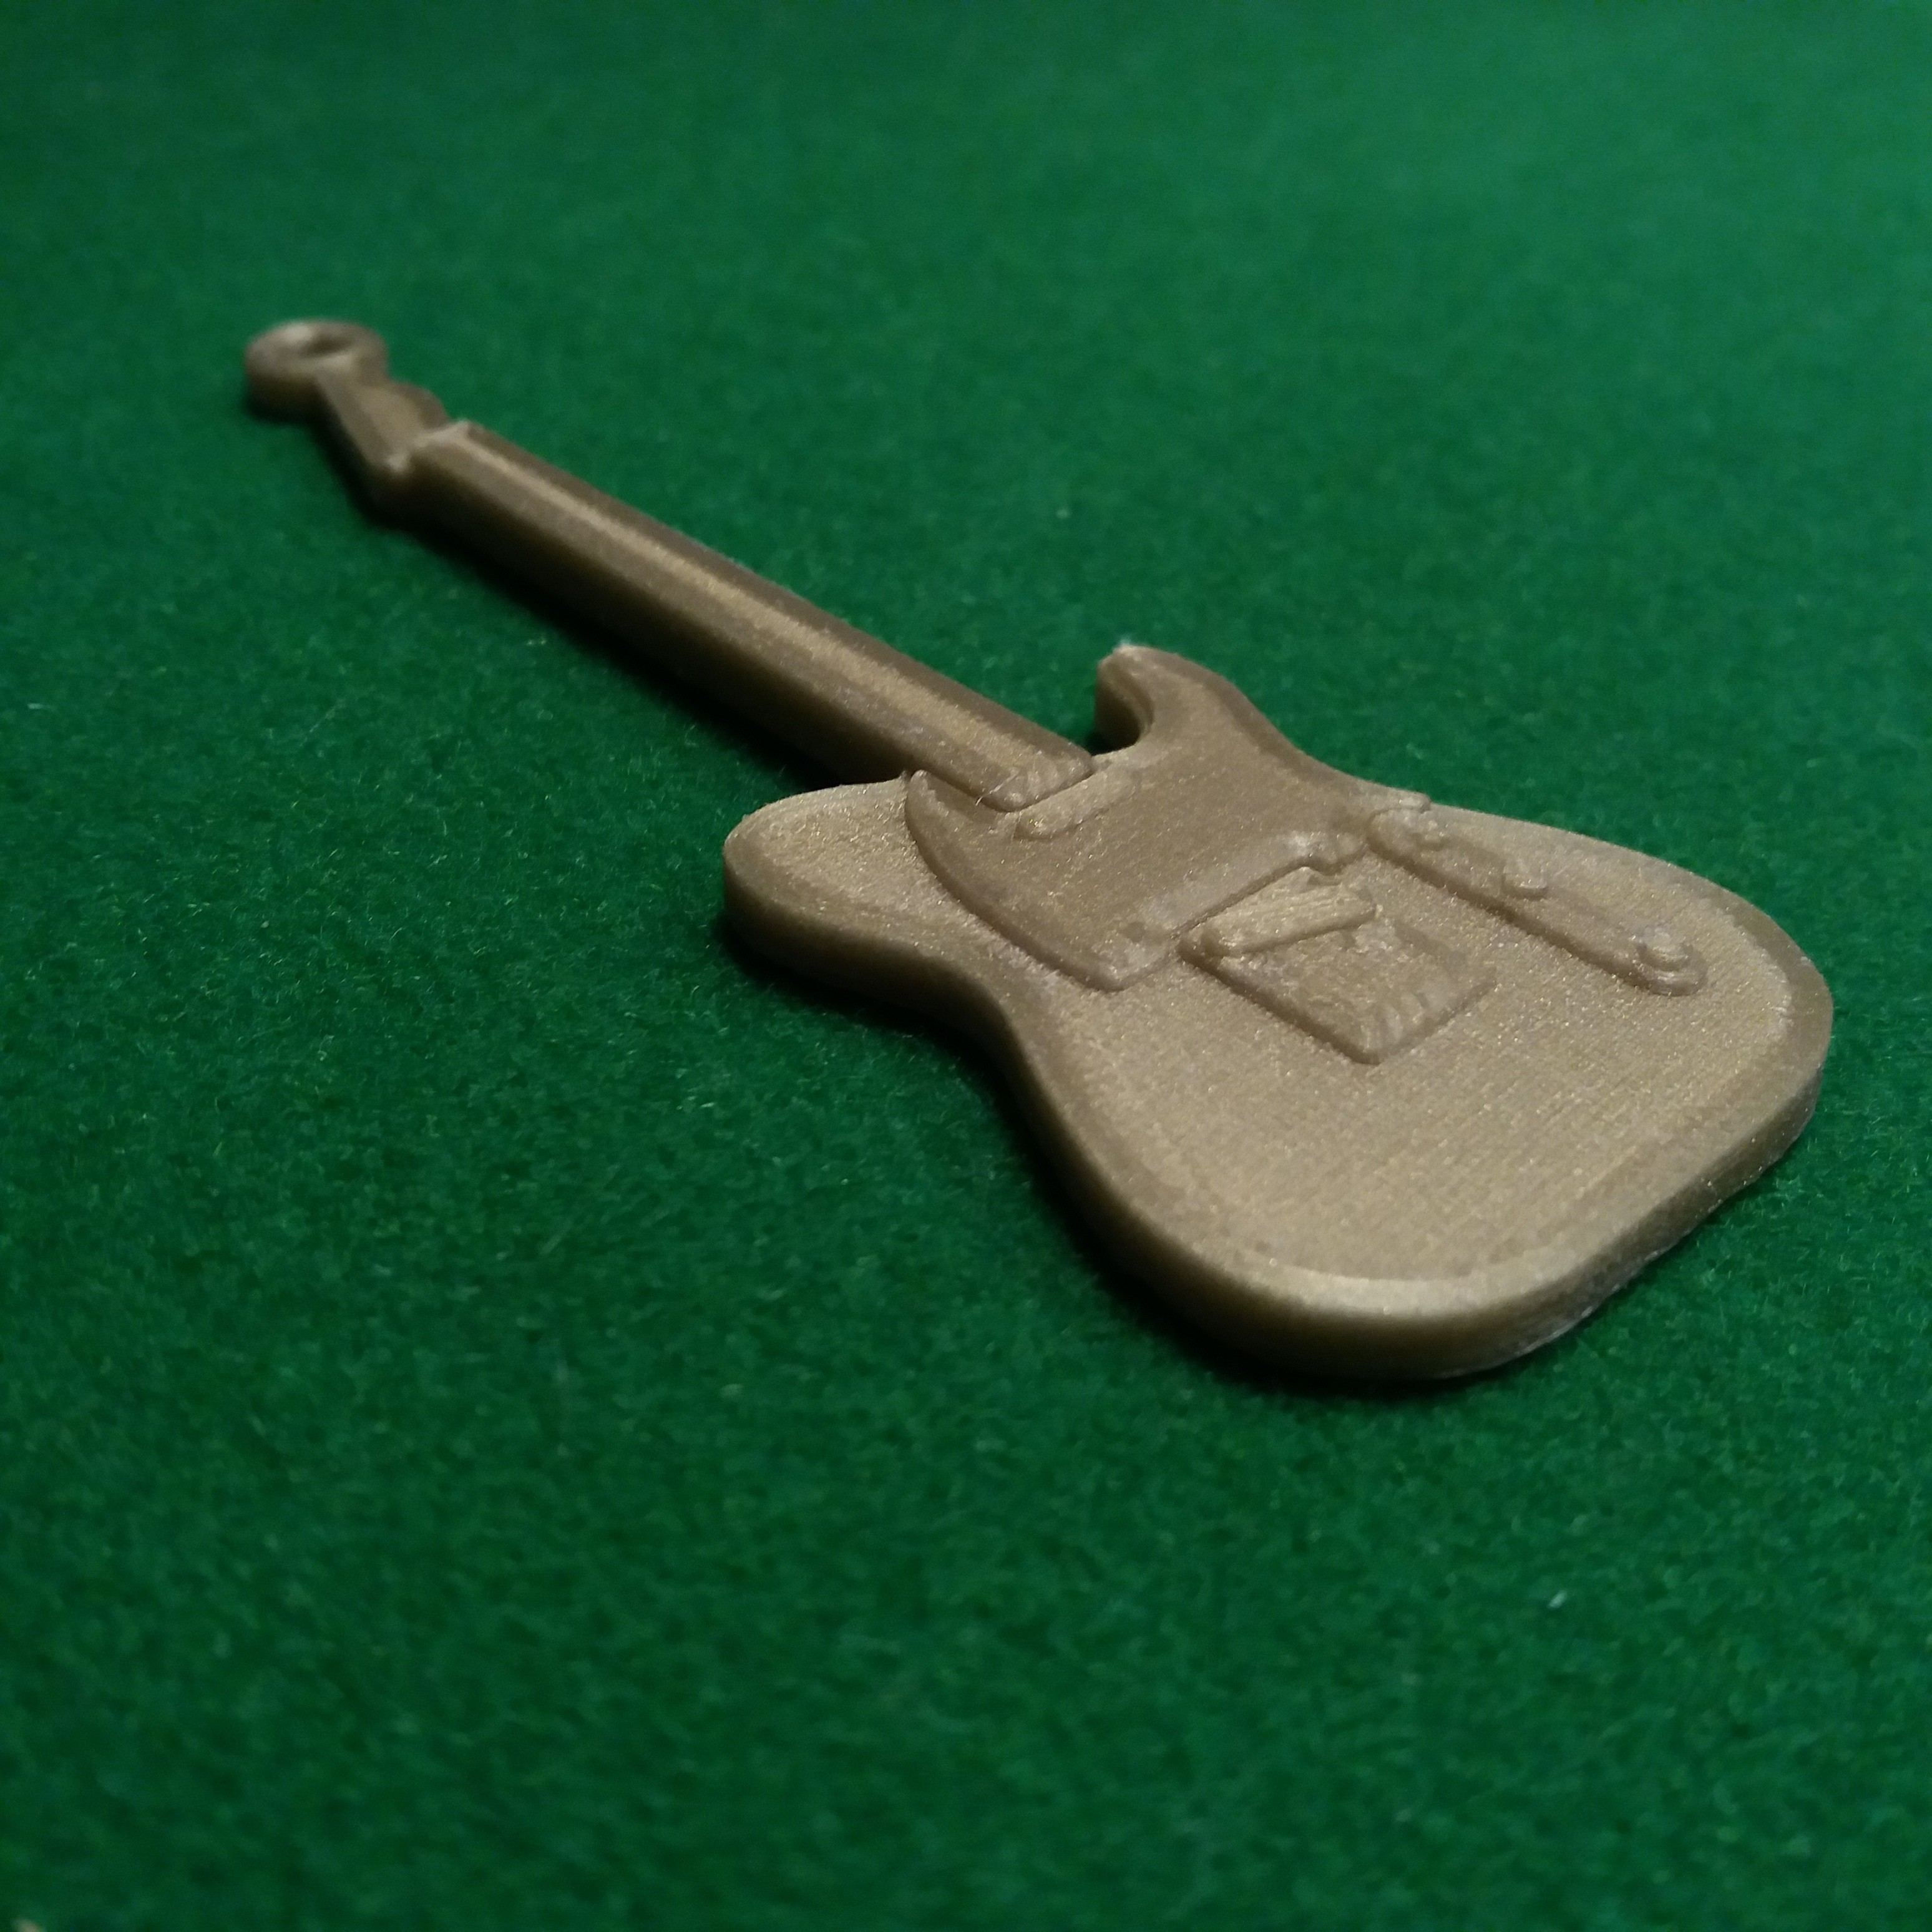 fenderv telecaster 1.jpg Download free STL file Fender Telecaster Guitar • 3D printer object, gerbat